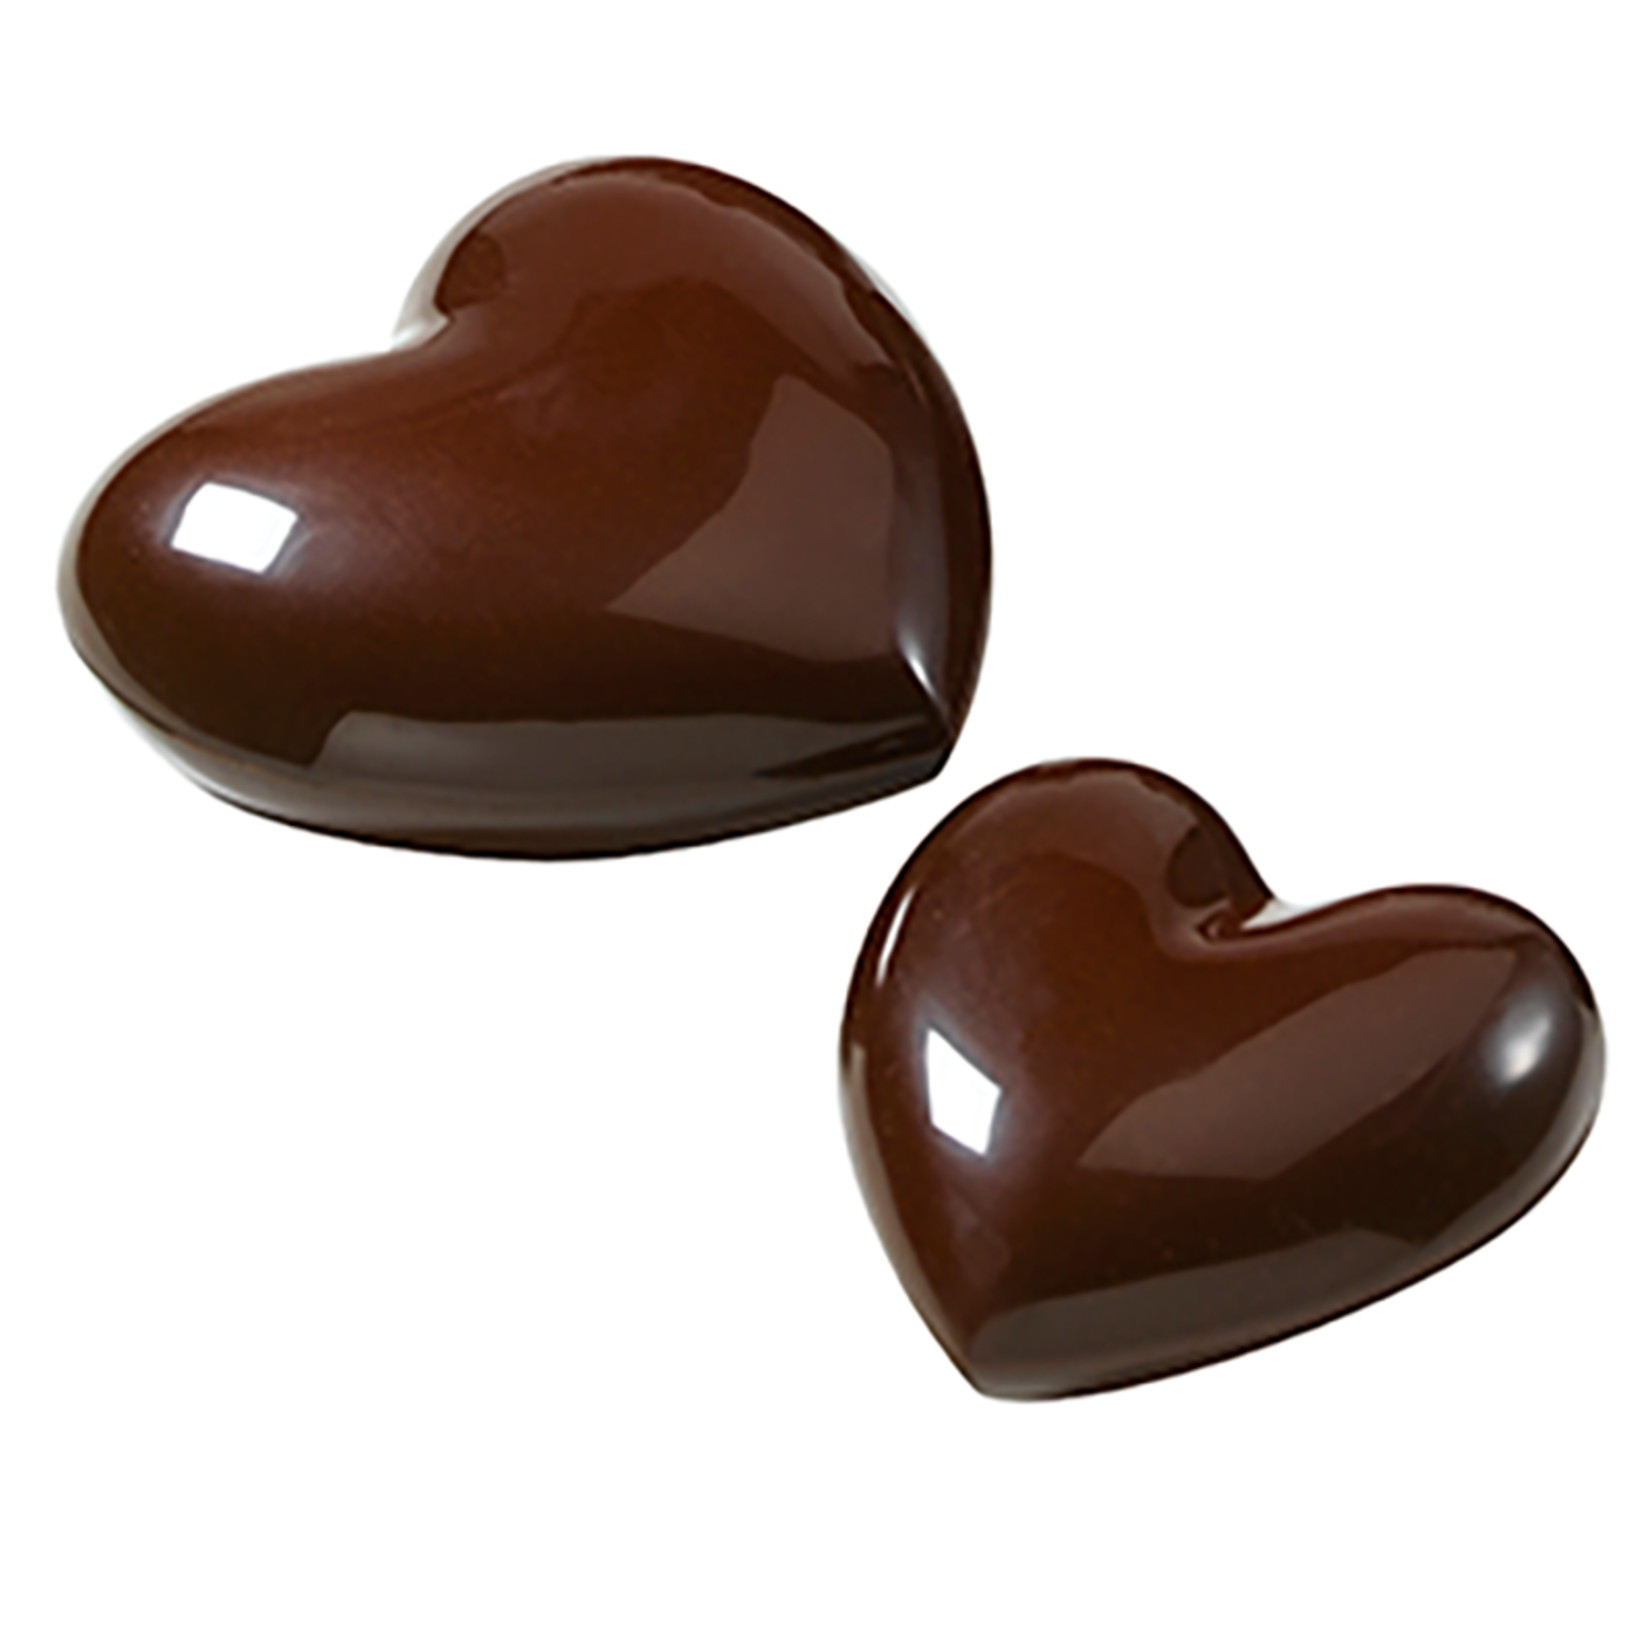 Cacao Barry Cacao Barry - Tritan Chocolate Mold - Heart, 8x10cm (4 cavity), MLD-090517-M00